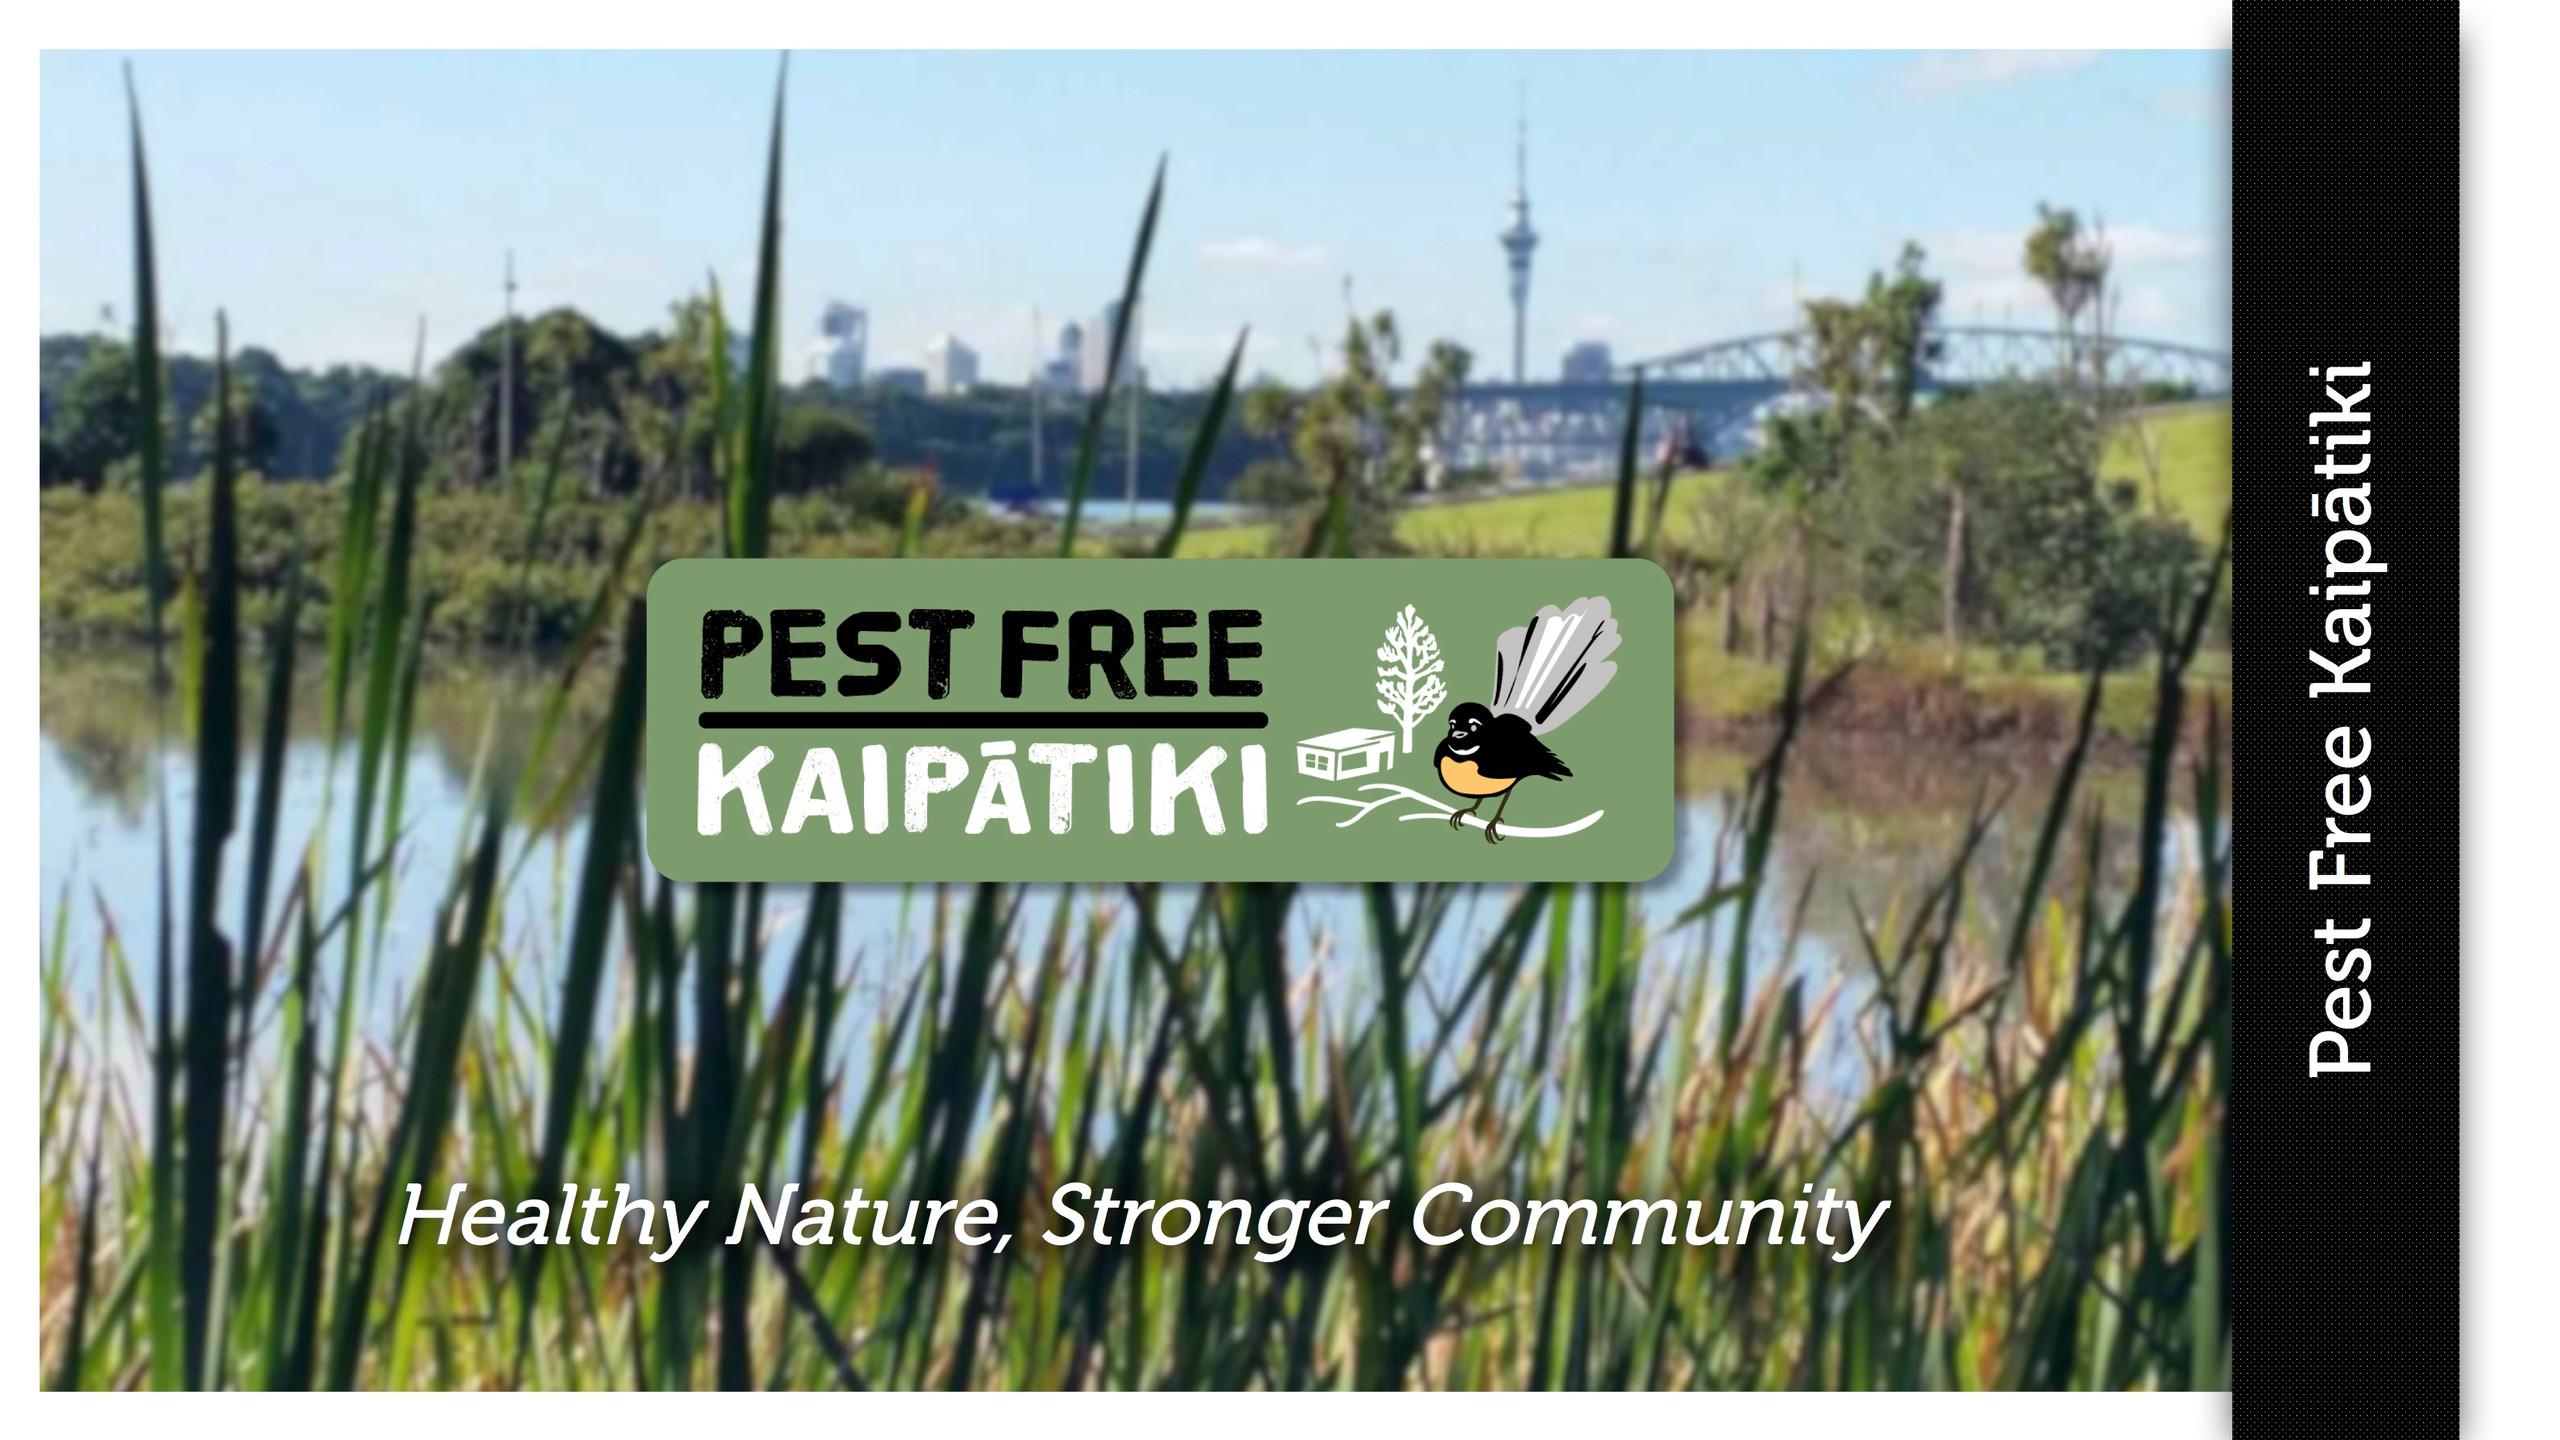 Pest Free Kaipatiki-Pestival-slide0